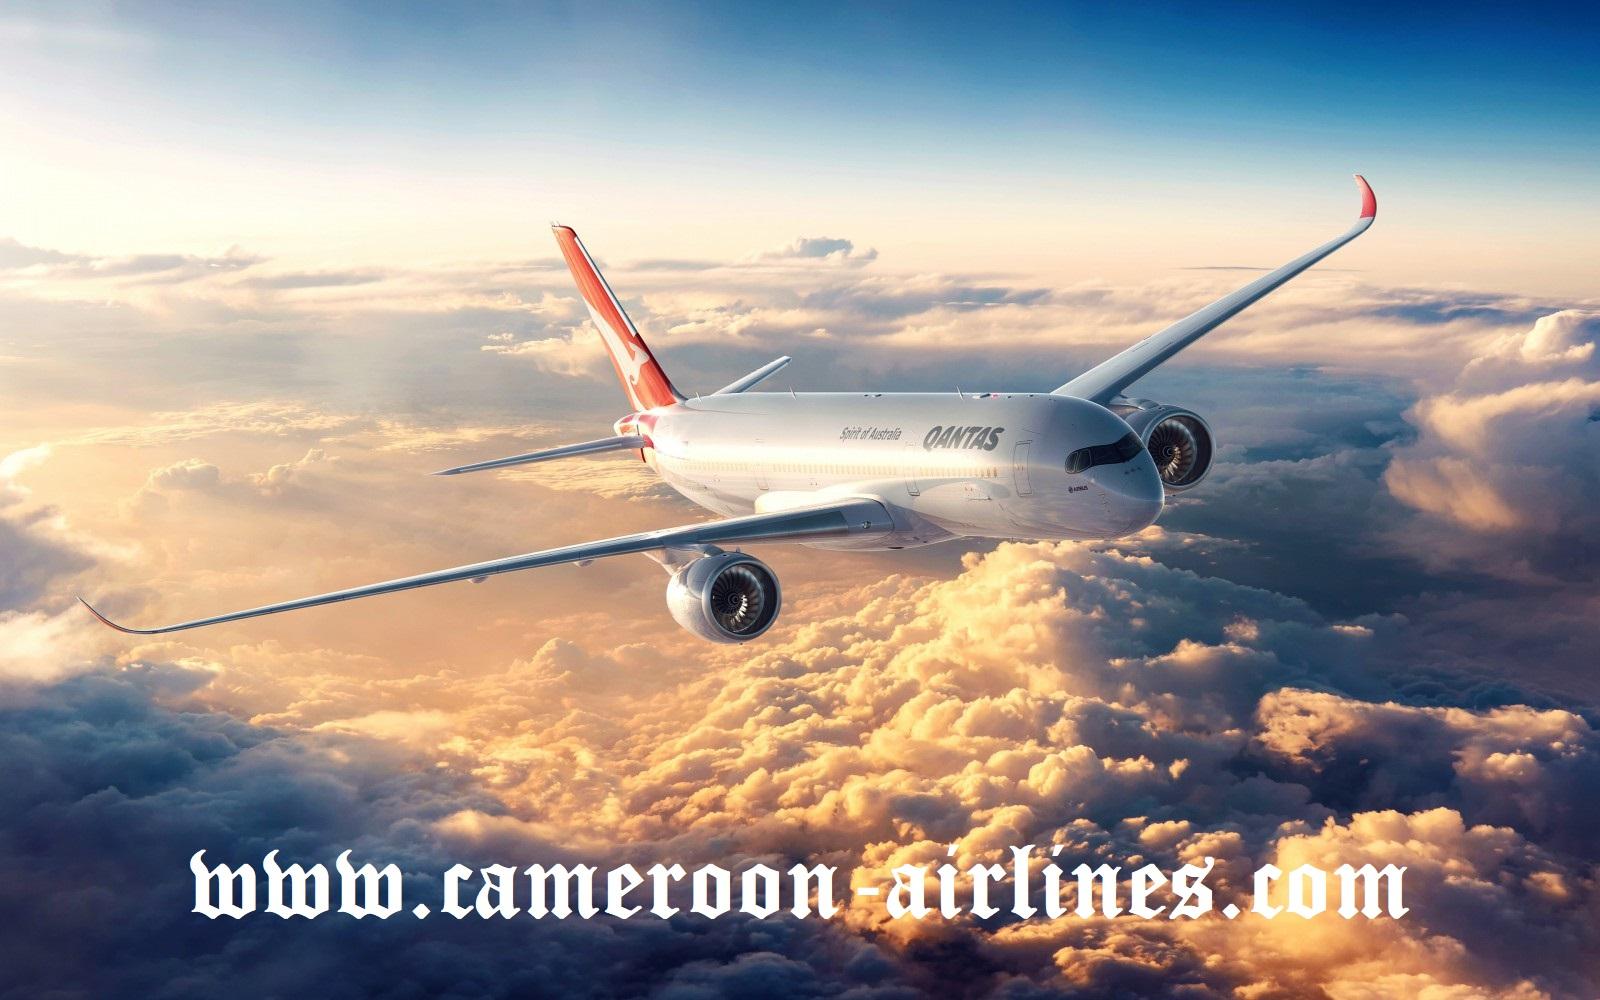 Qantas Airlines Terapkan Wajib Vaksin Untuk Penumpang Internasional